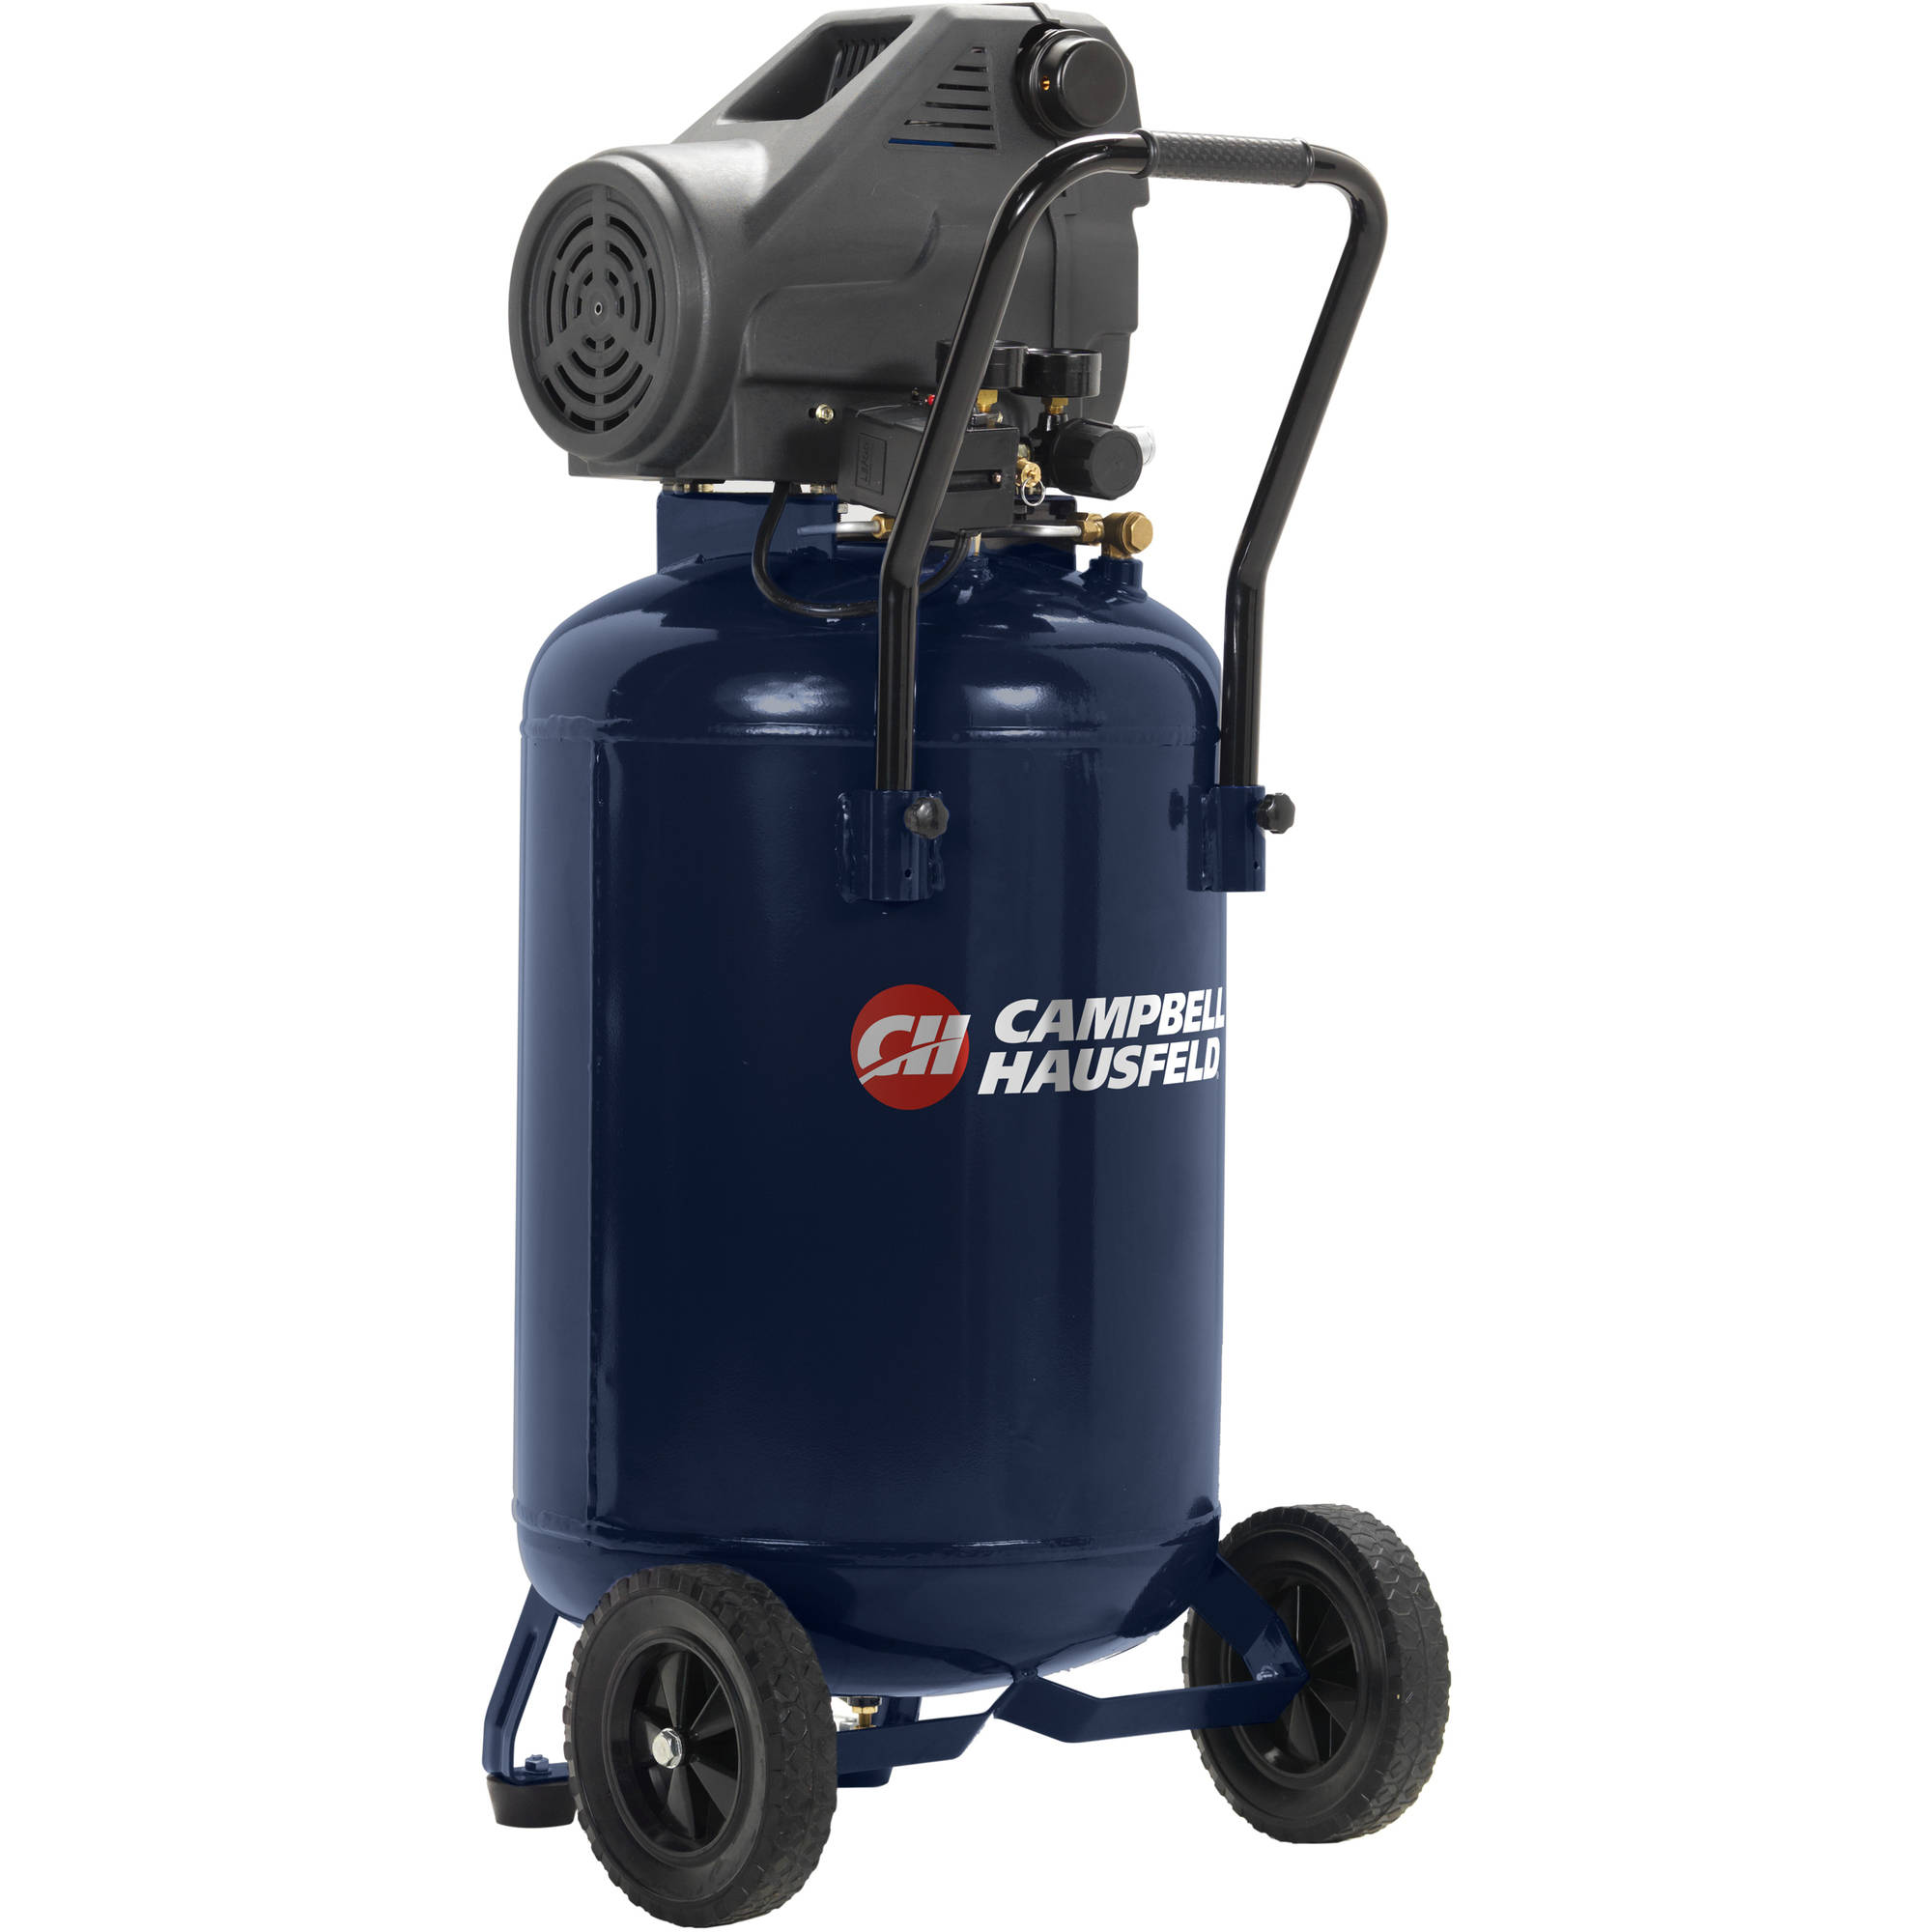 Campbell Hausfeld 20g Oil-Free Air Compressor